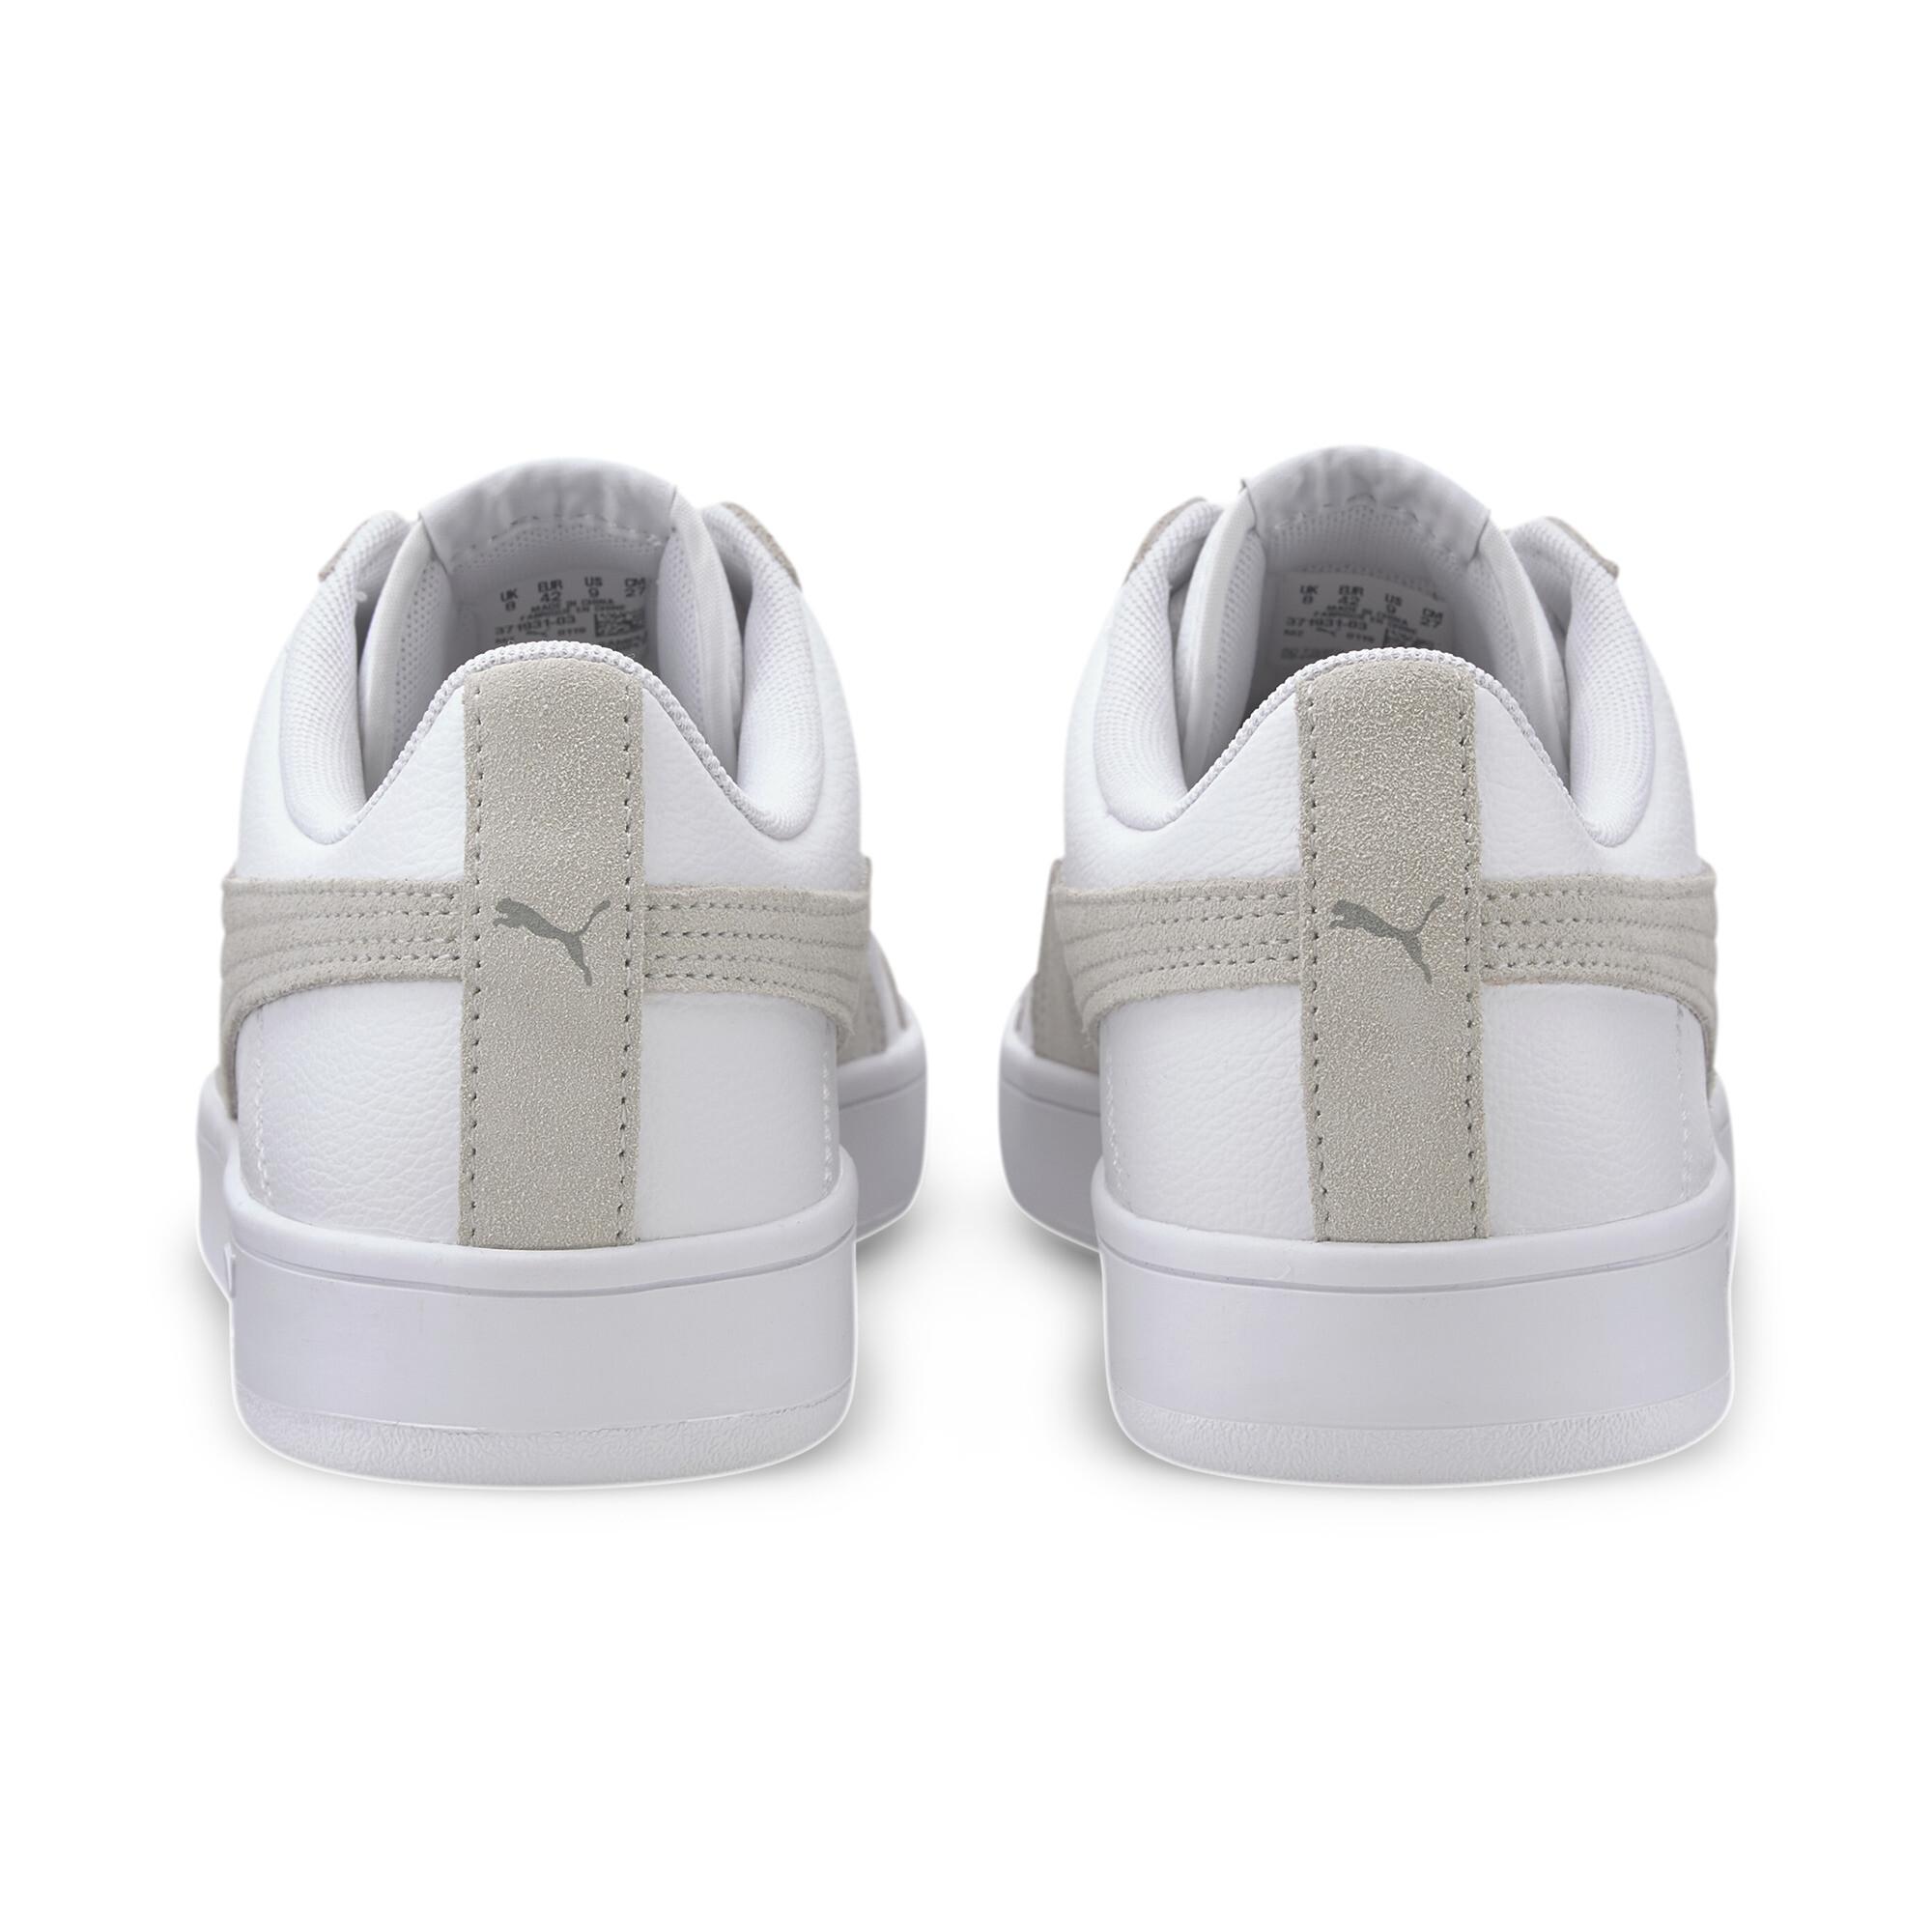 Indexbild 9 - PUMA Court Legend Lo Sneaker Unisex Schuhe Basics Neu